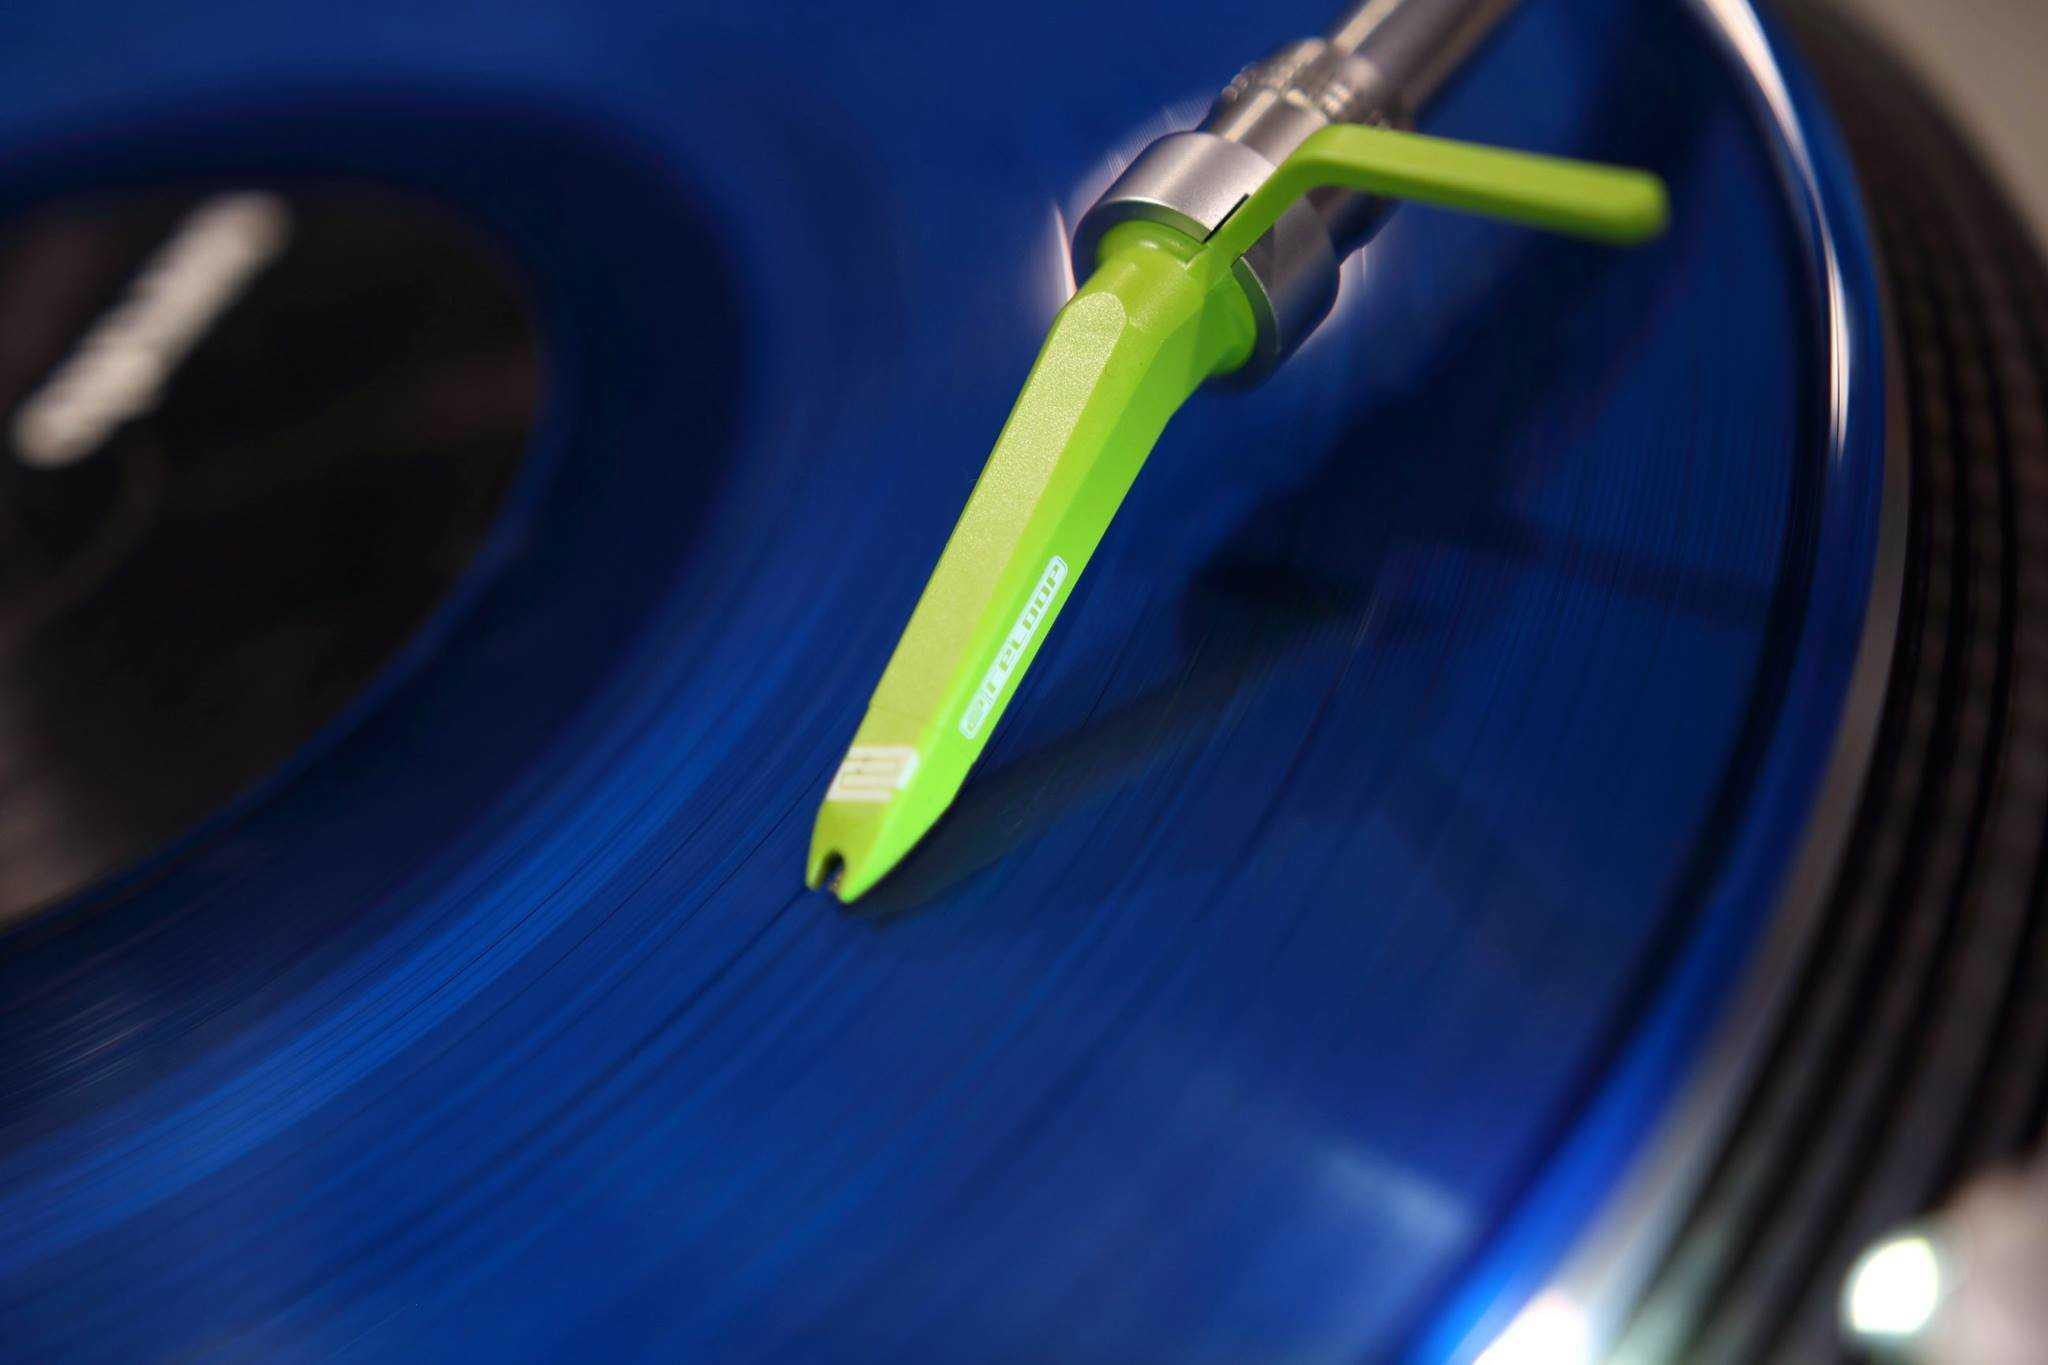 free record pool_record pool_dj record pool_trap music_open format_guide_diy